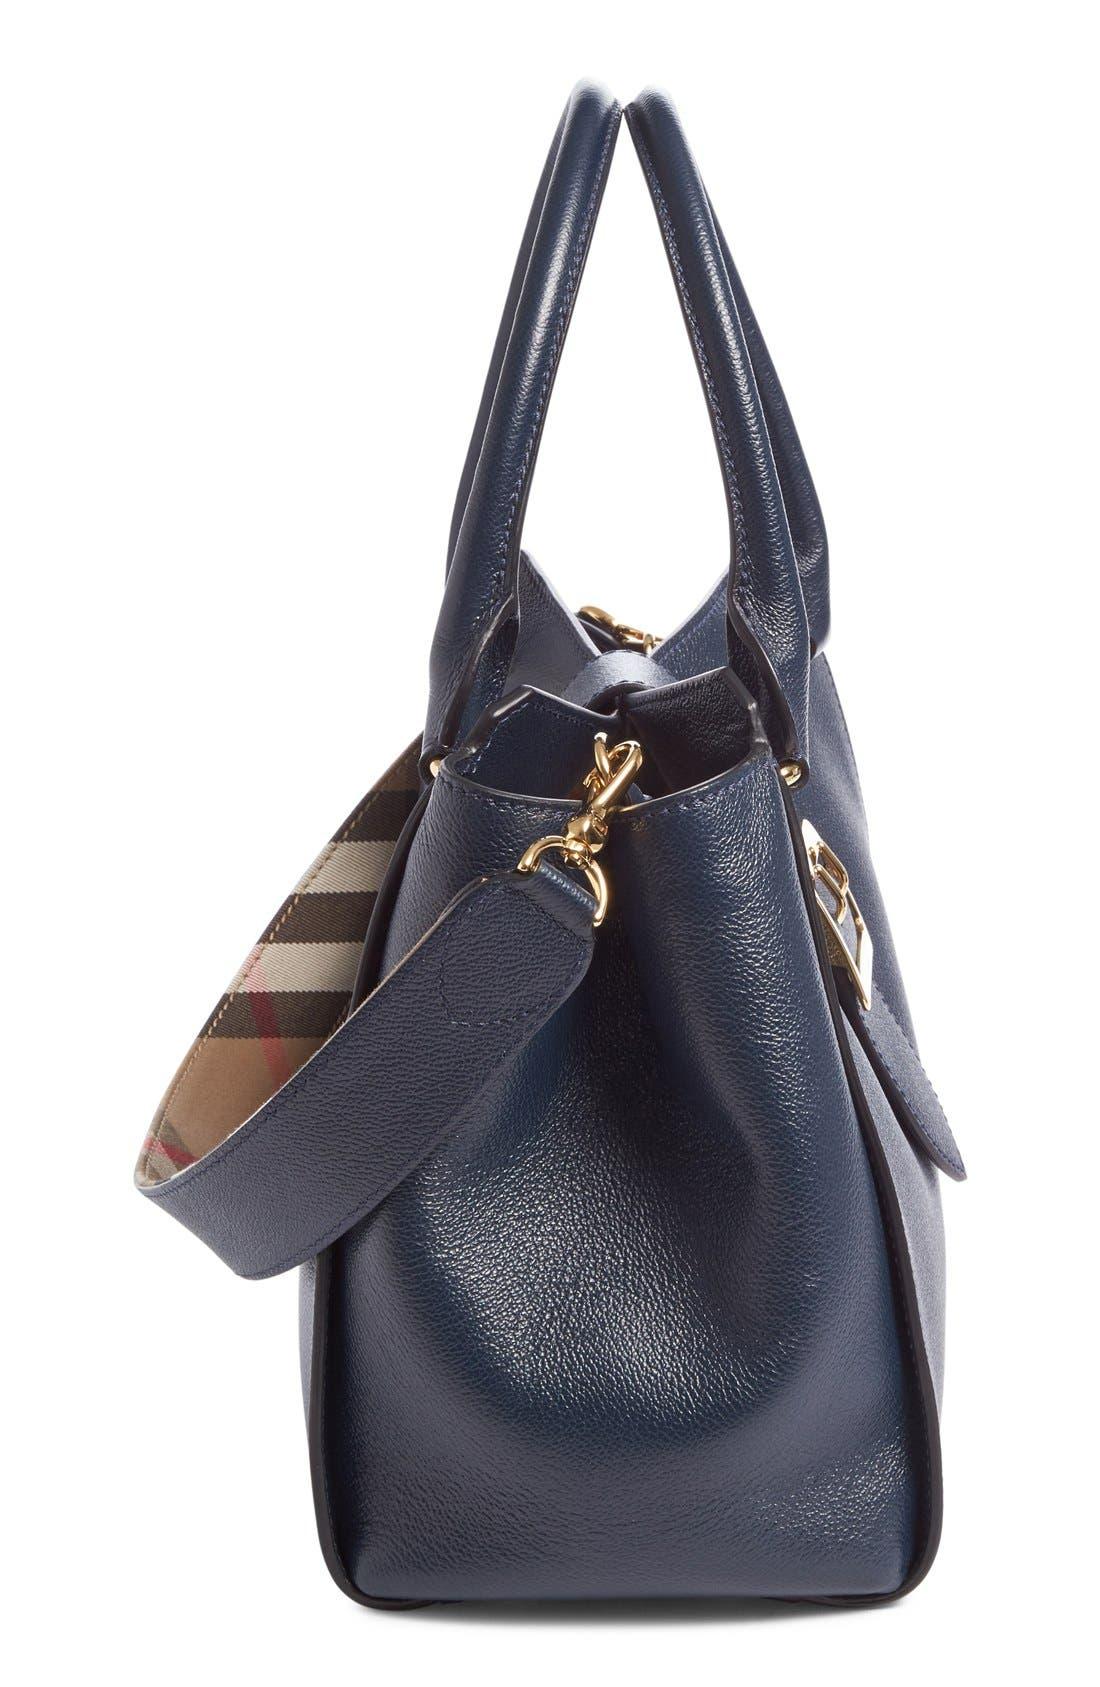 Medium Buckle Calfskin Leather Tote,                             Alternate thumbnail 5, color,                             Blue Carbon